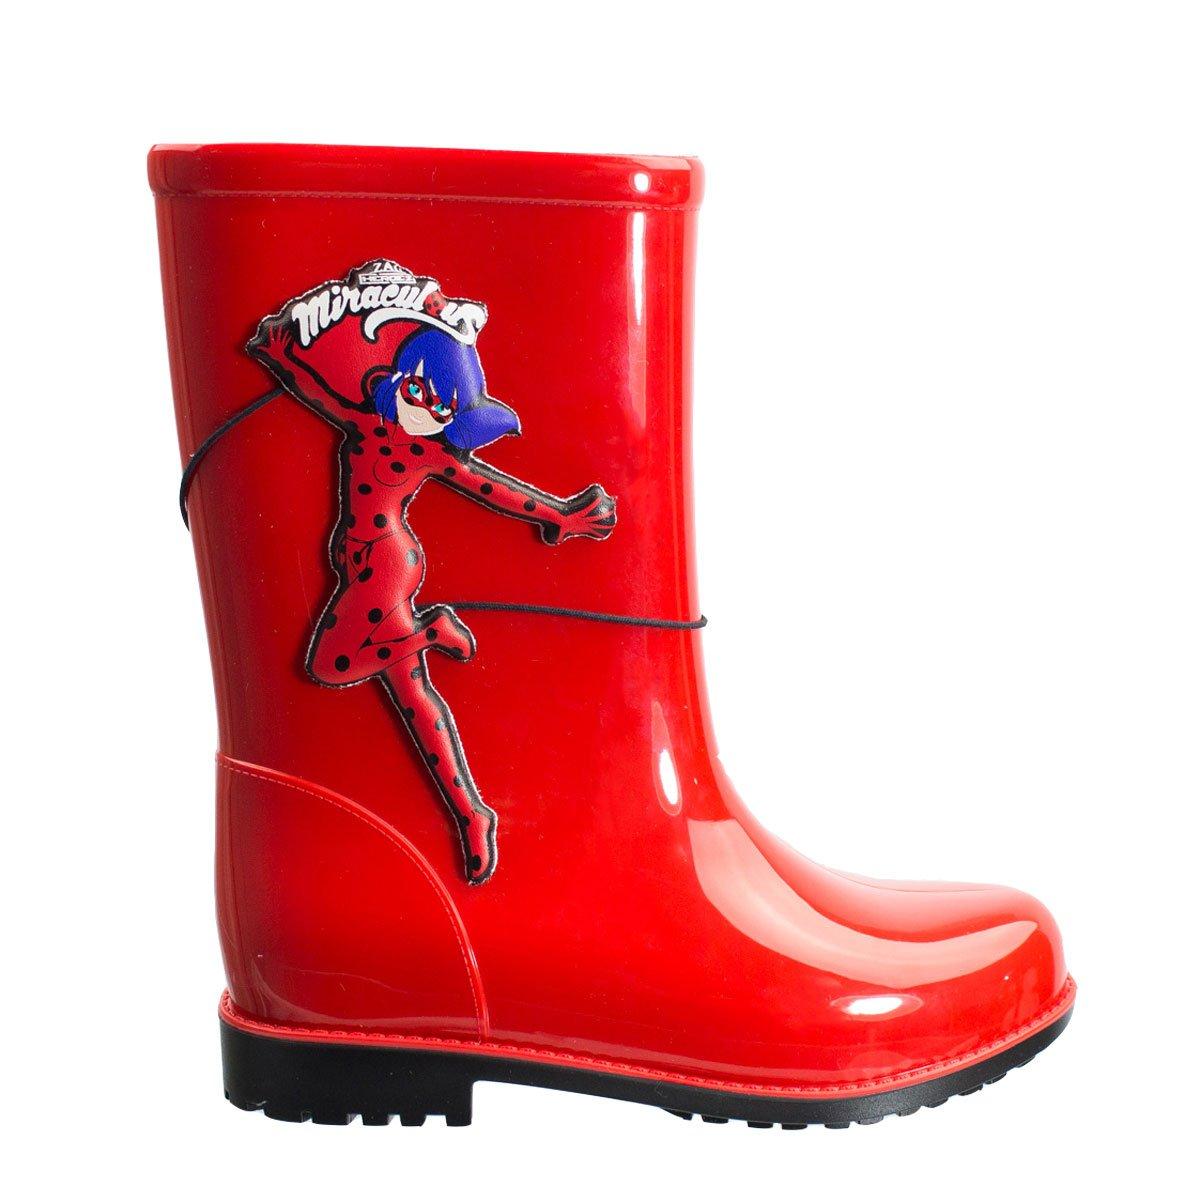 04b4725ee20 Bizz Store - Galocha Infantil Menina Grendene Ladybug Love Dots